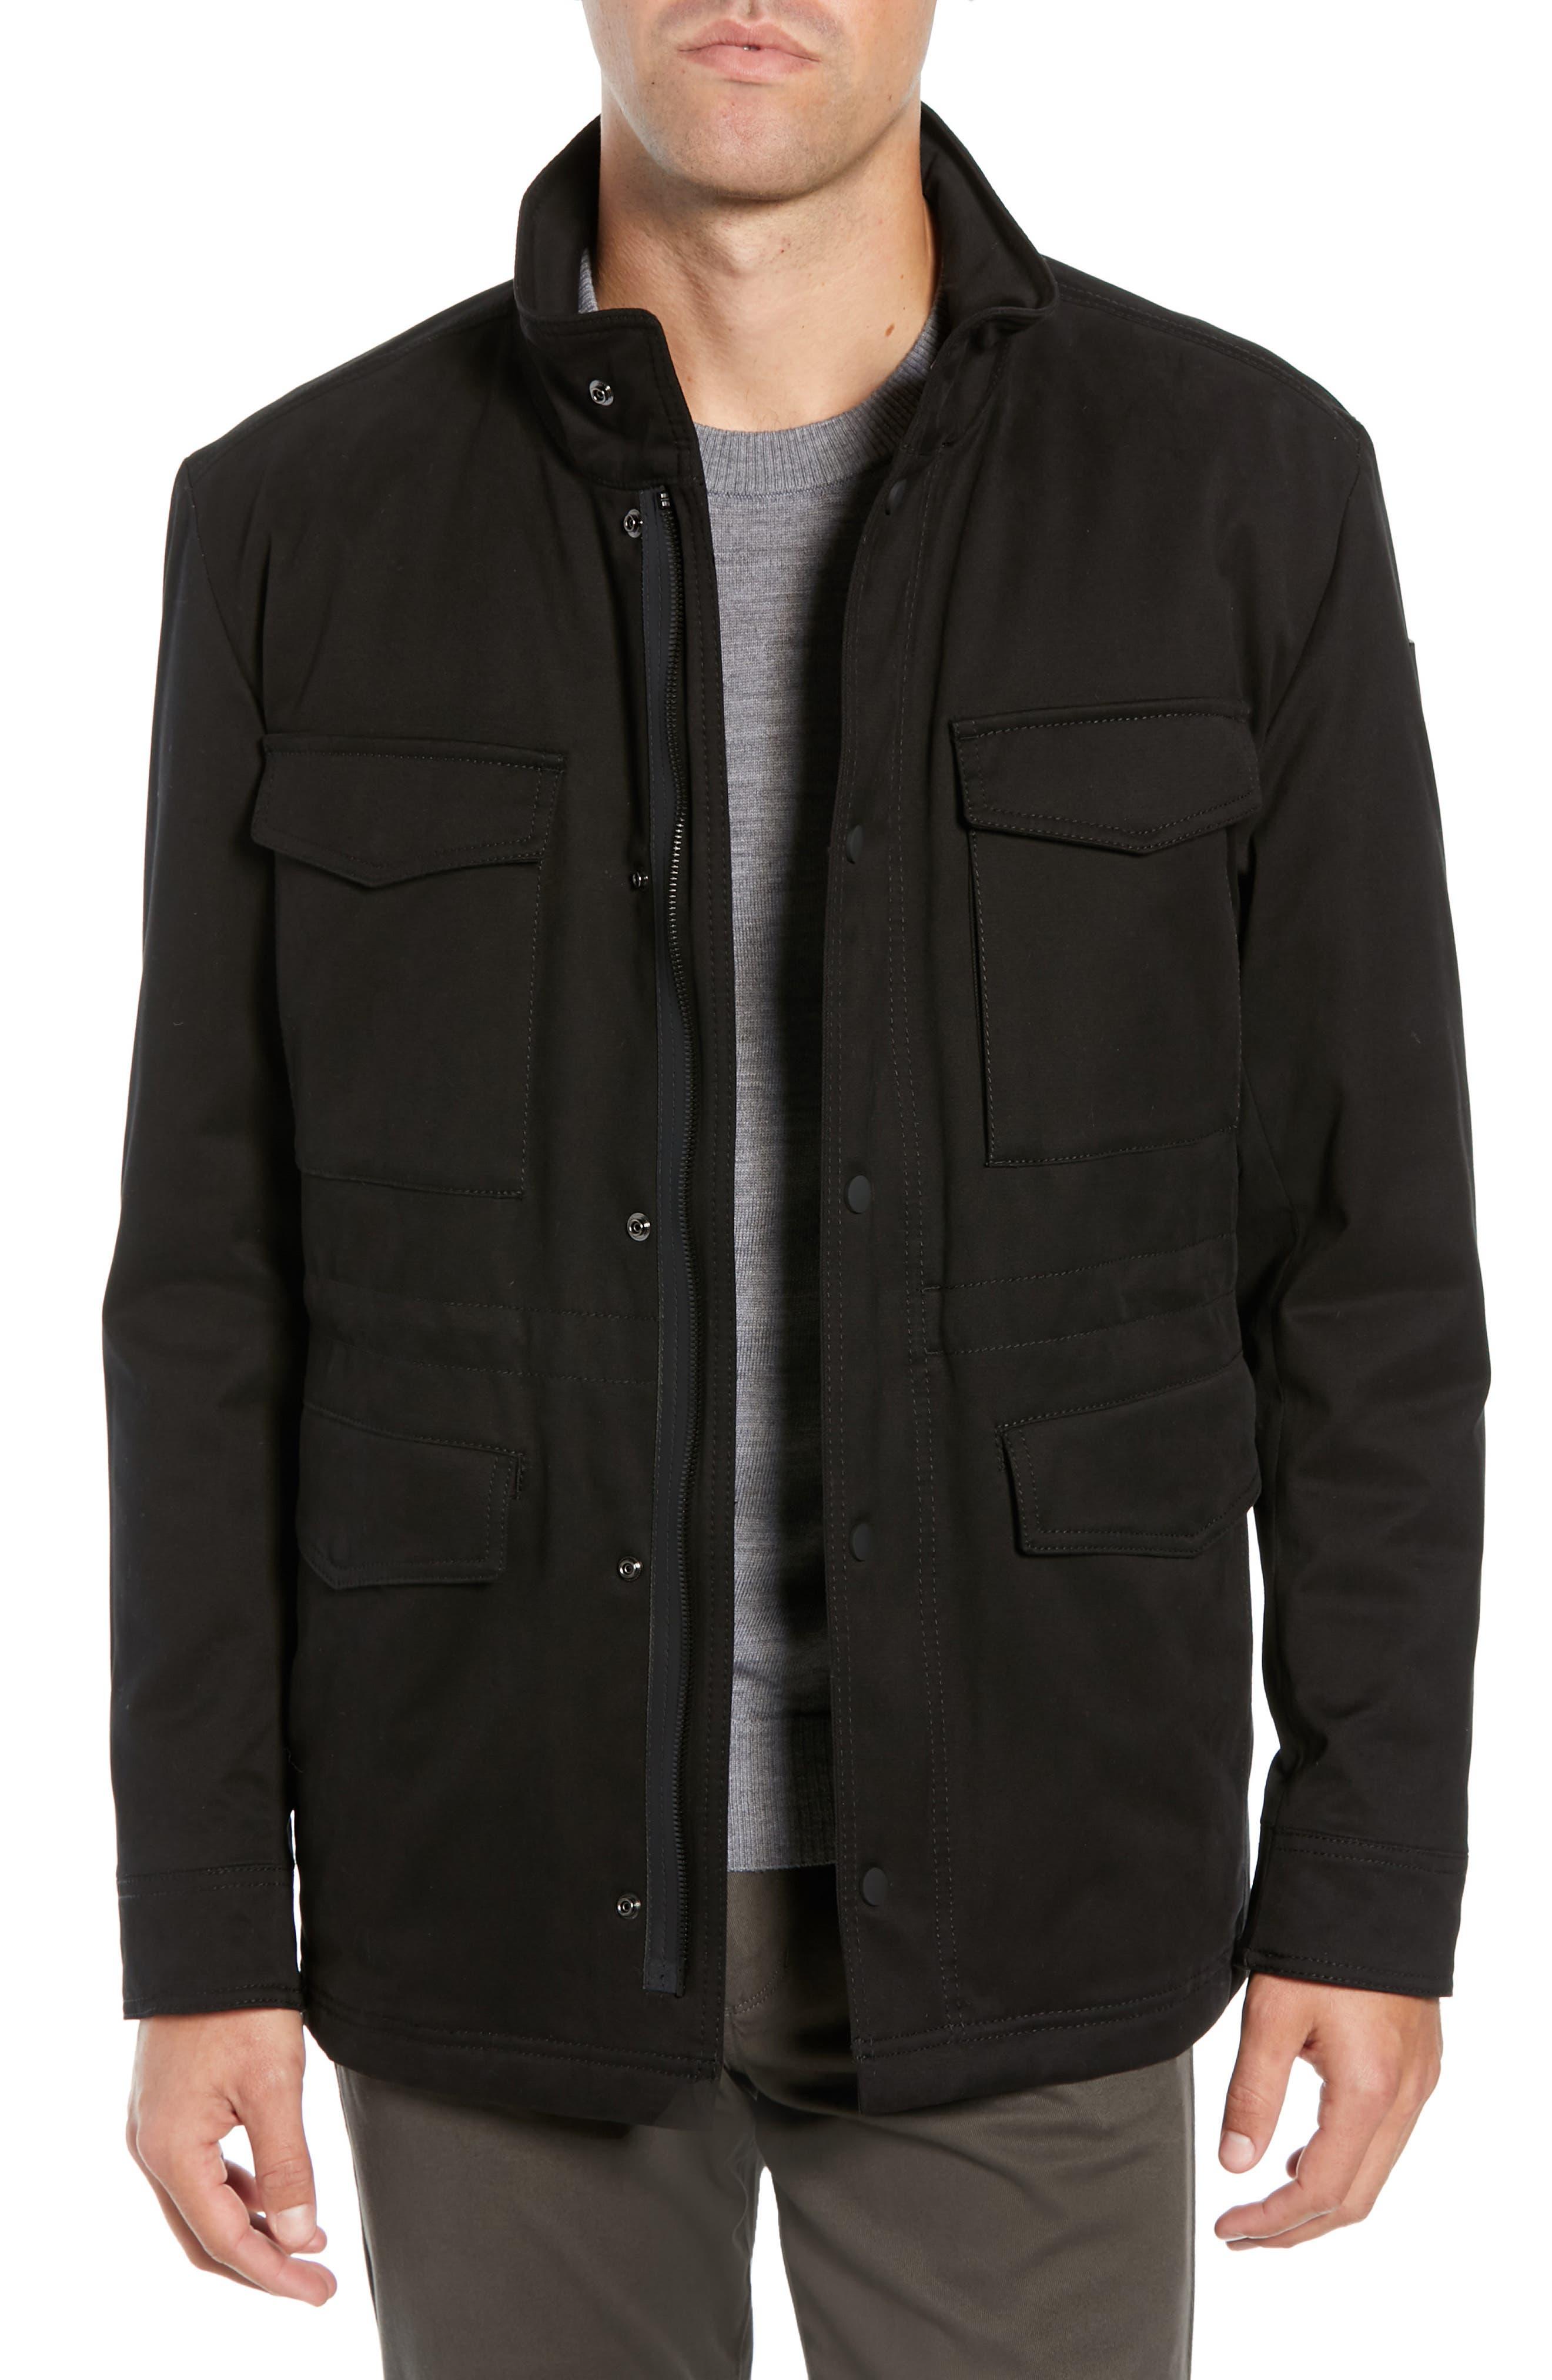 Oroy Regular Fit Field Jacket,                             Main thumbnail 1, color,                             BLACK